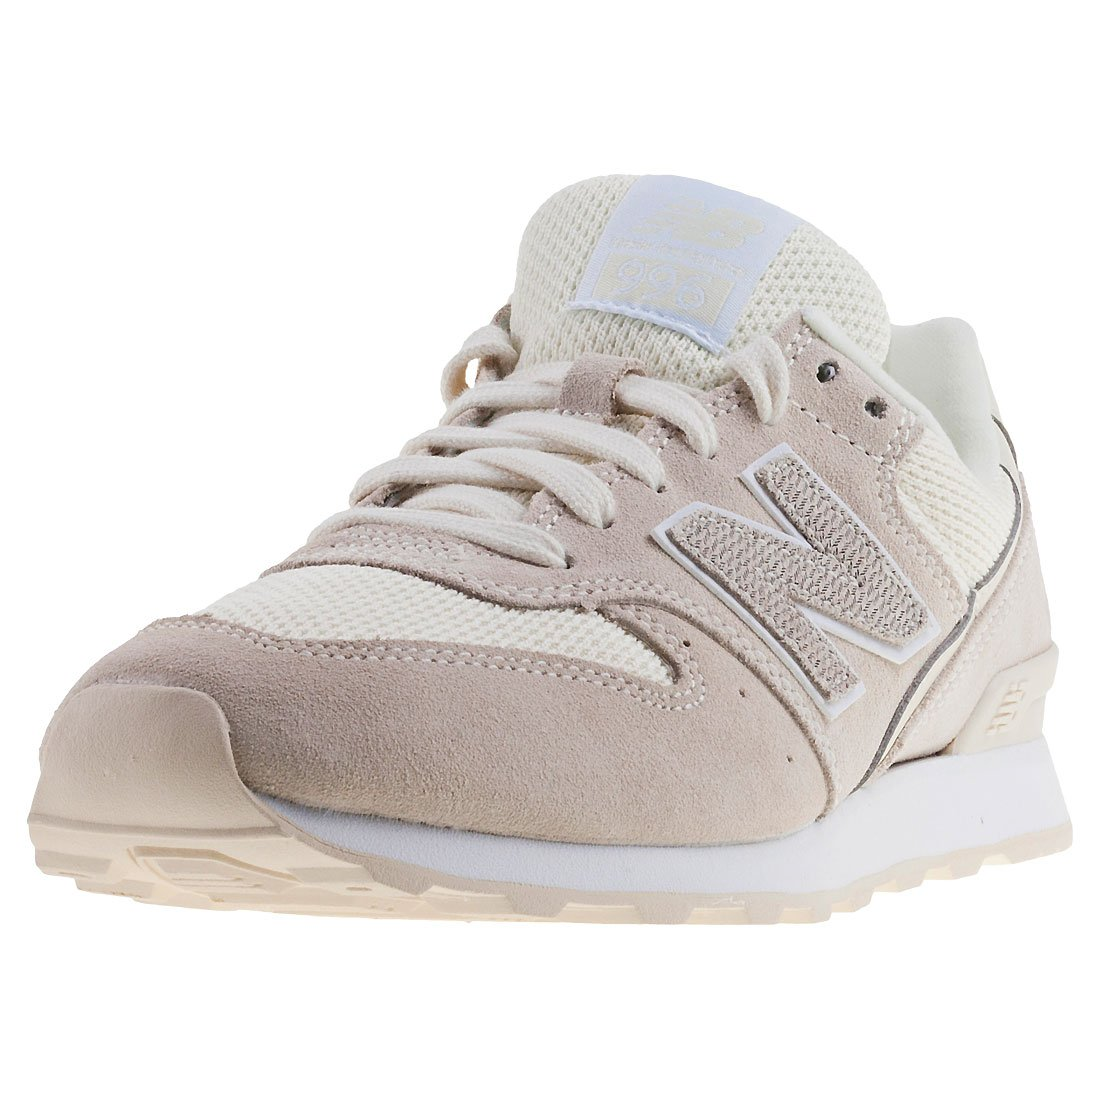 TALLA 36.5 EU. New Balance Wr996-lcb-d, Zapatillas para Mujer